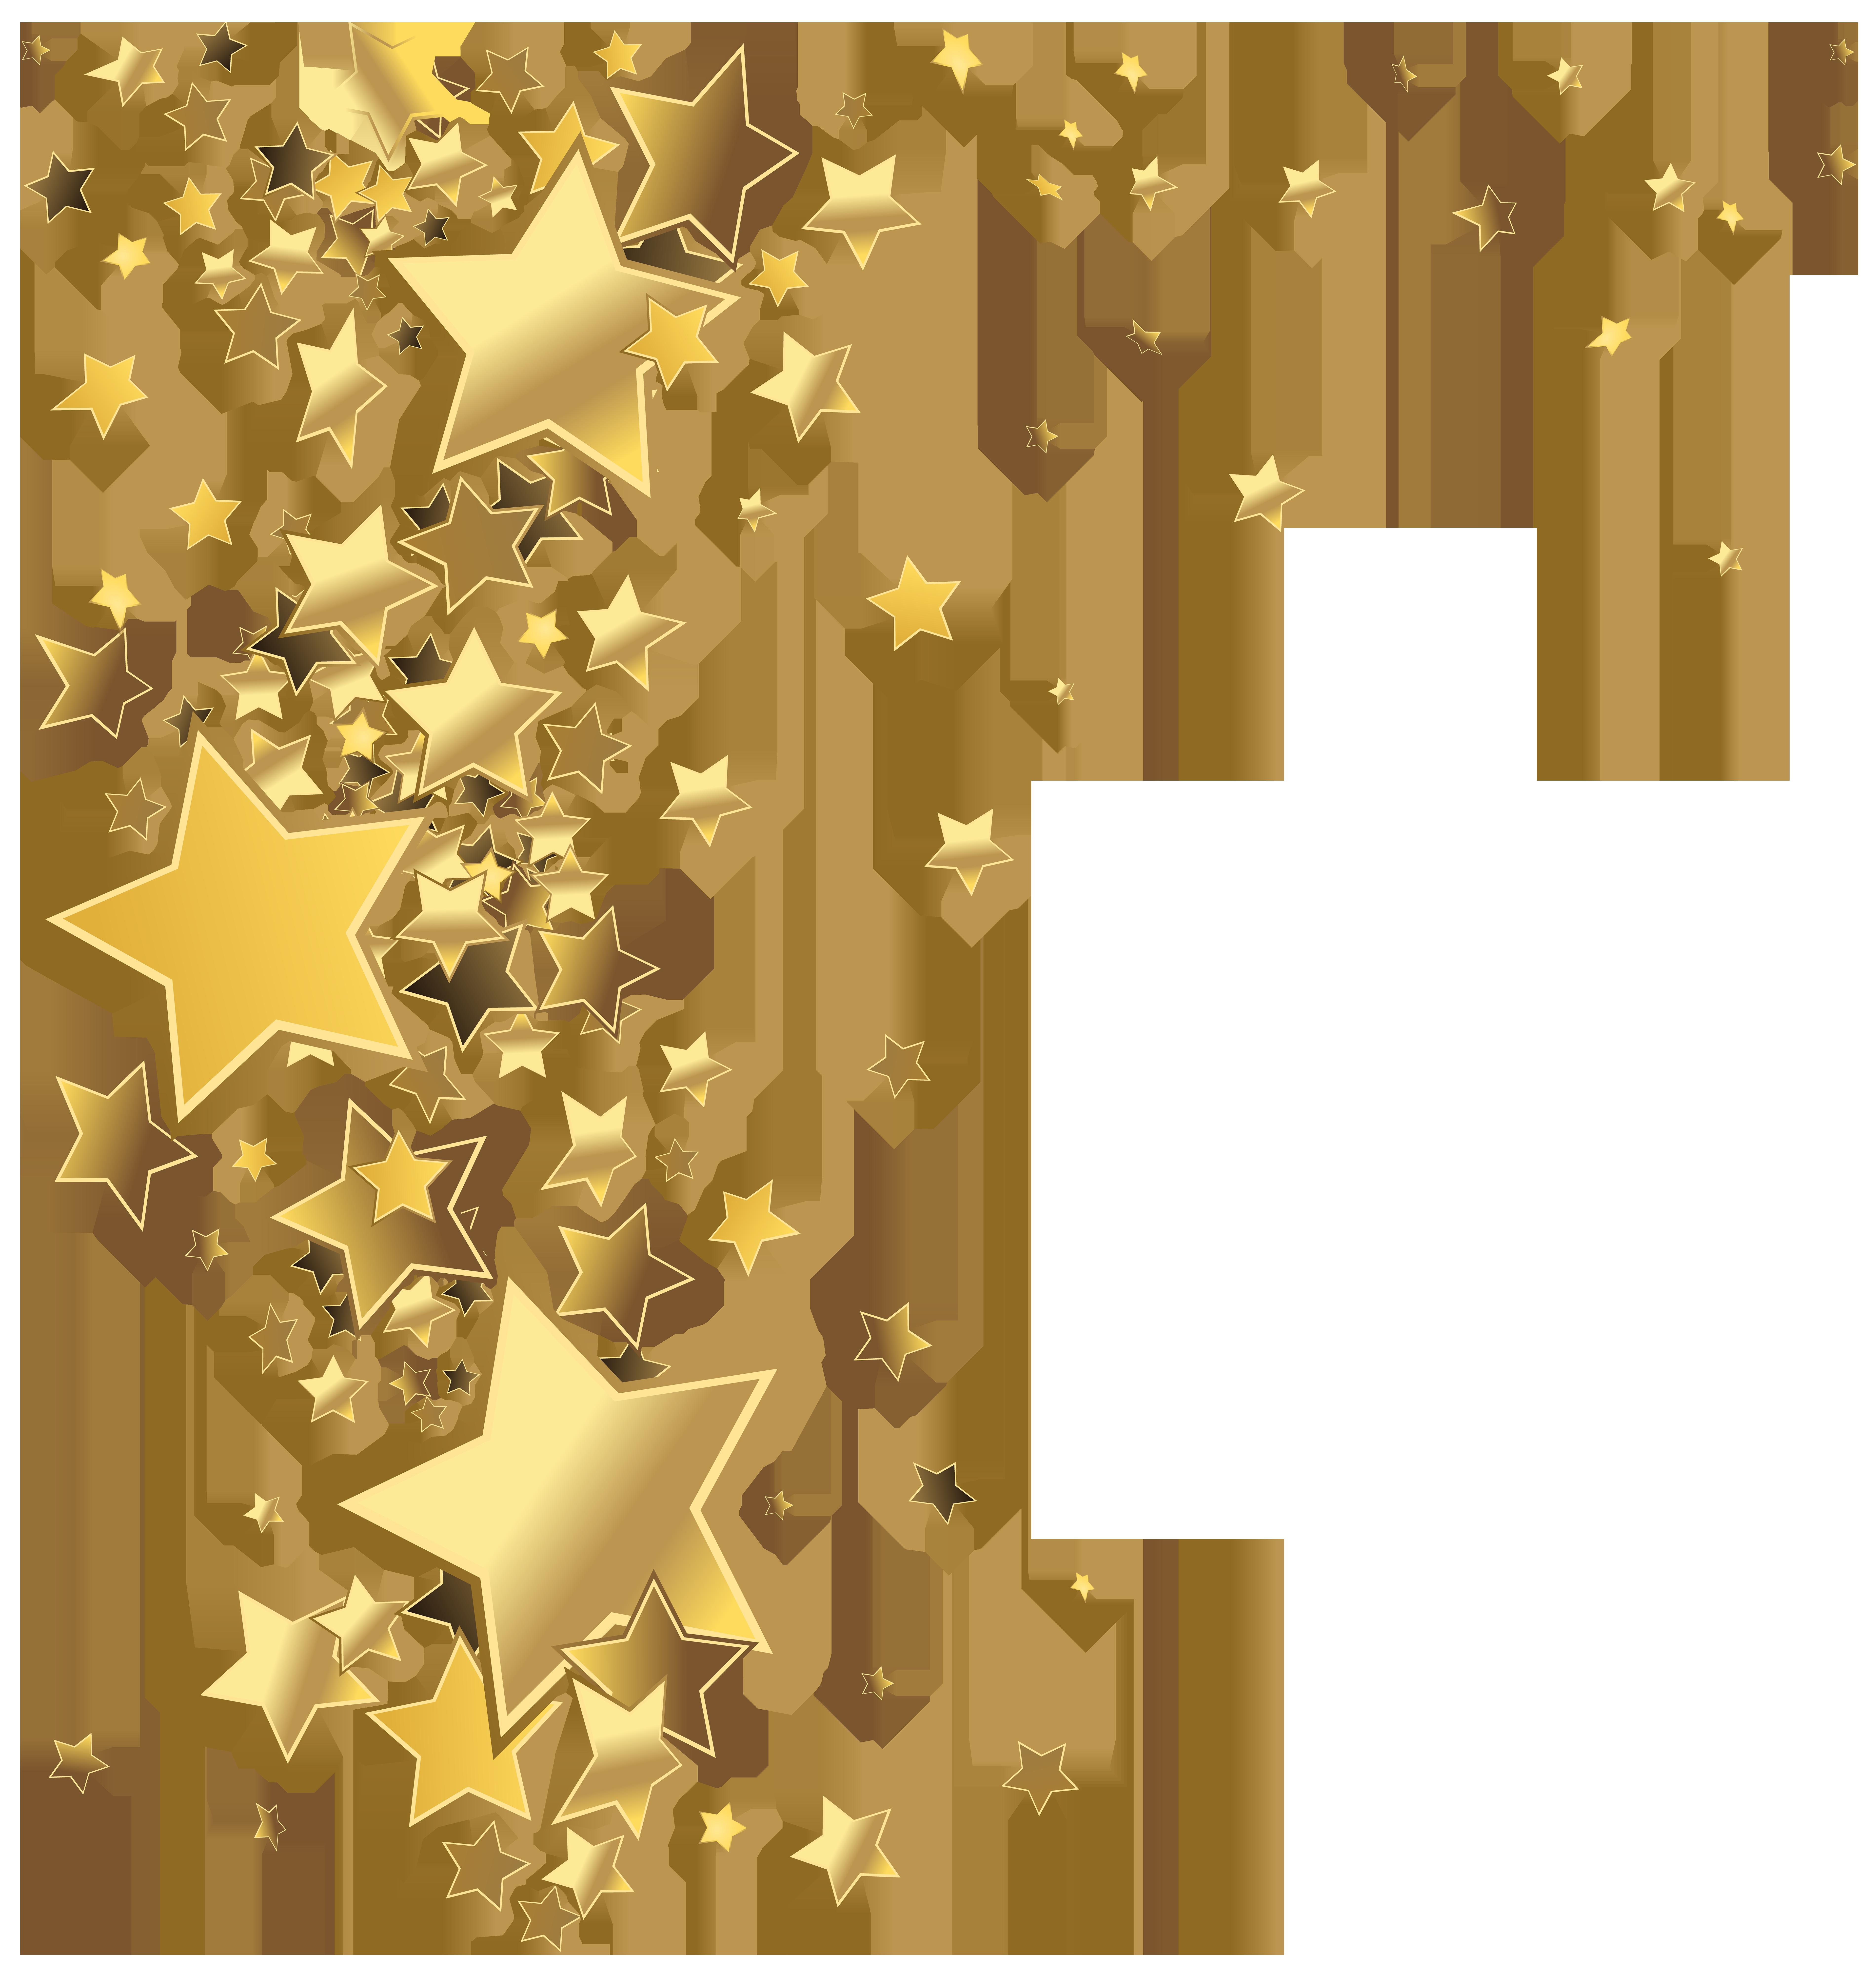 Star Desktop Wallpaper Clip art.